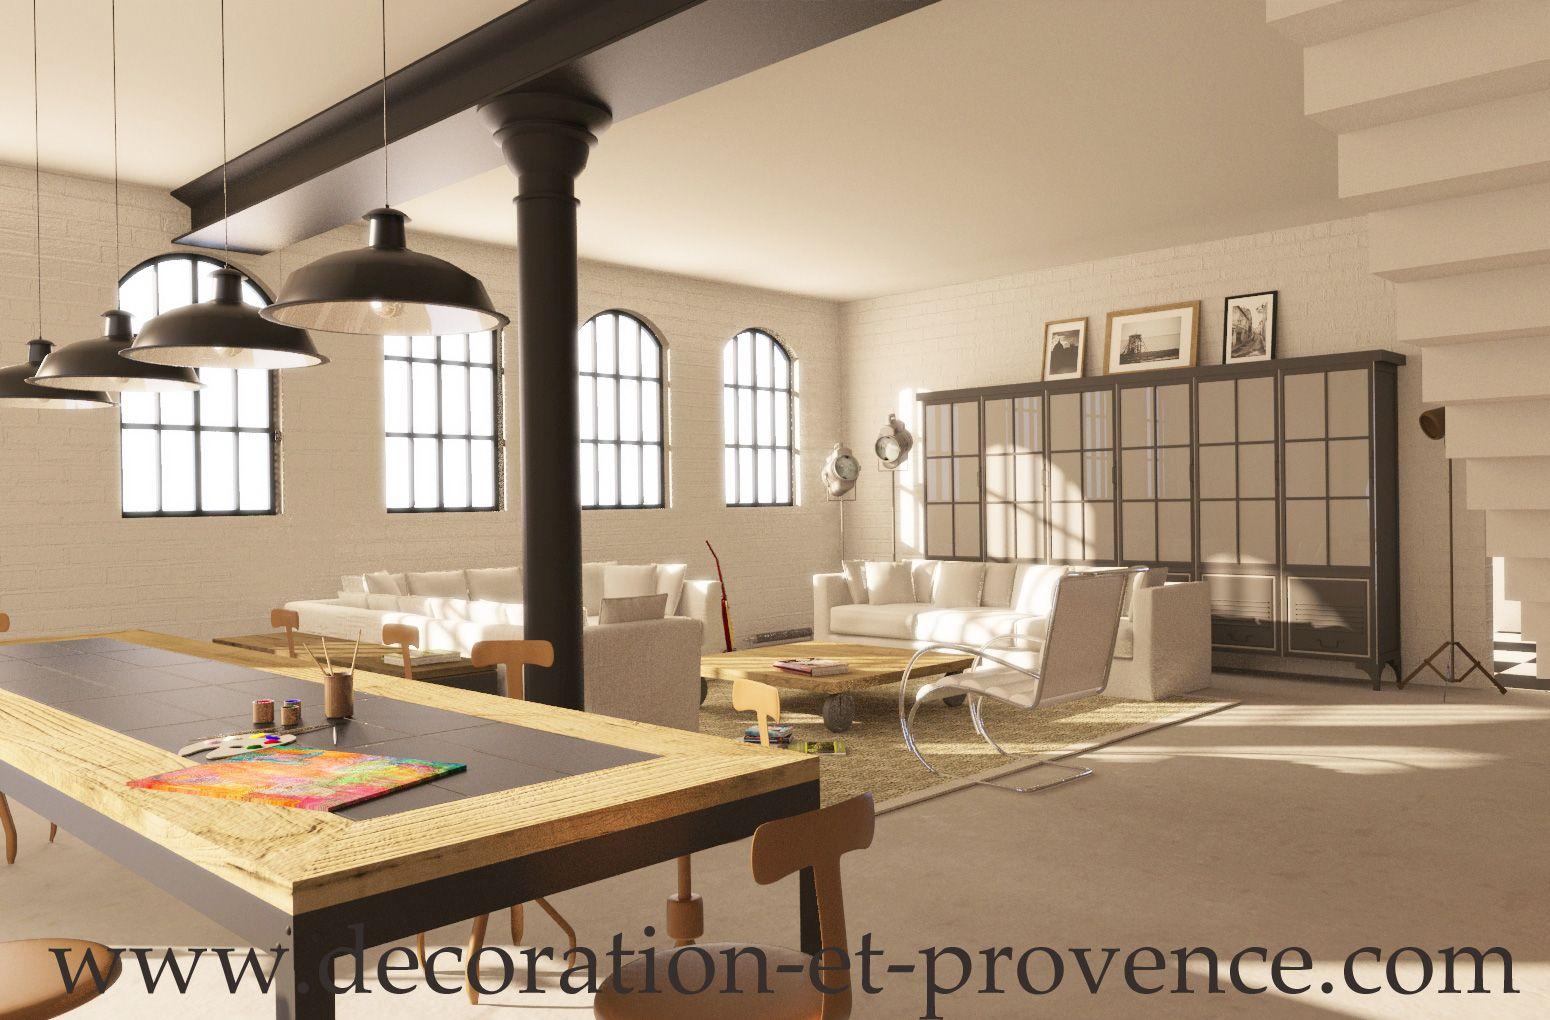 d coration d 39 int rieure d 39 un loft industriel interior design loft industriel mat riaux brut. Black Bedroom Furniture Sets. Home Design Ideas